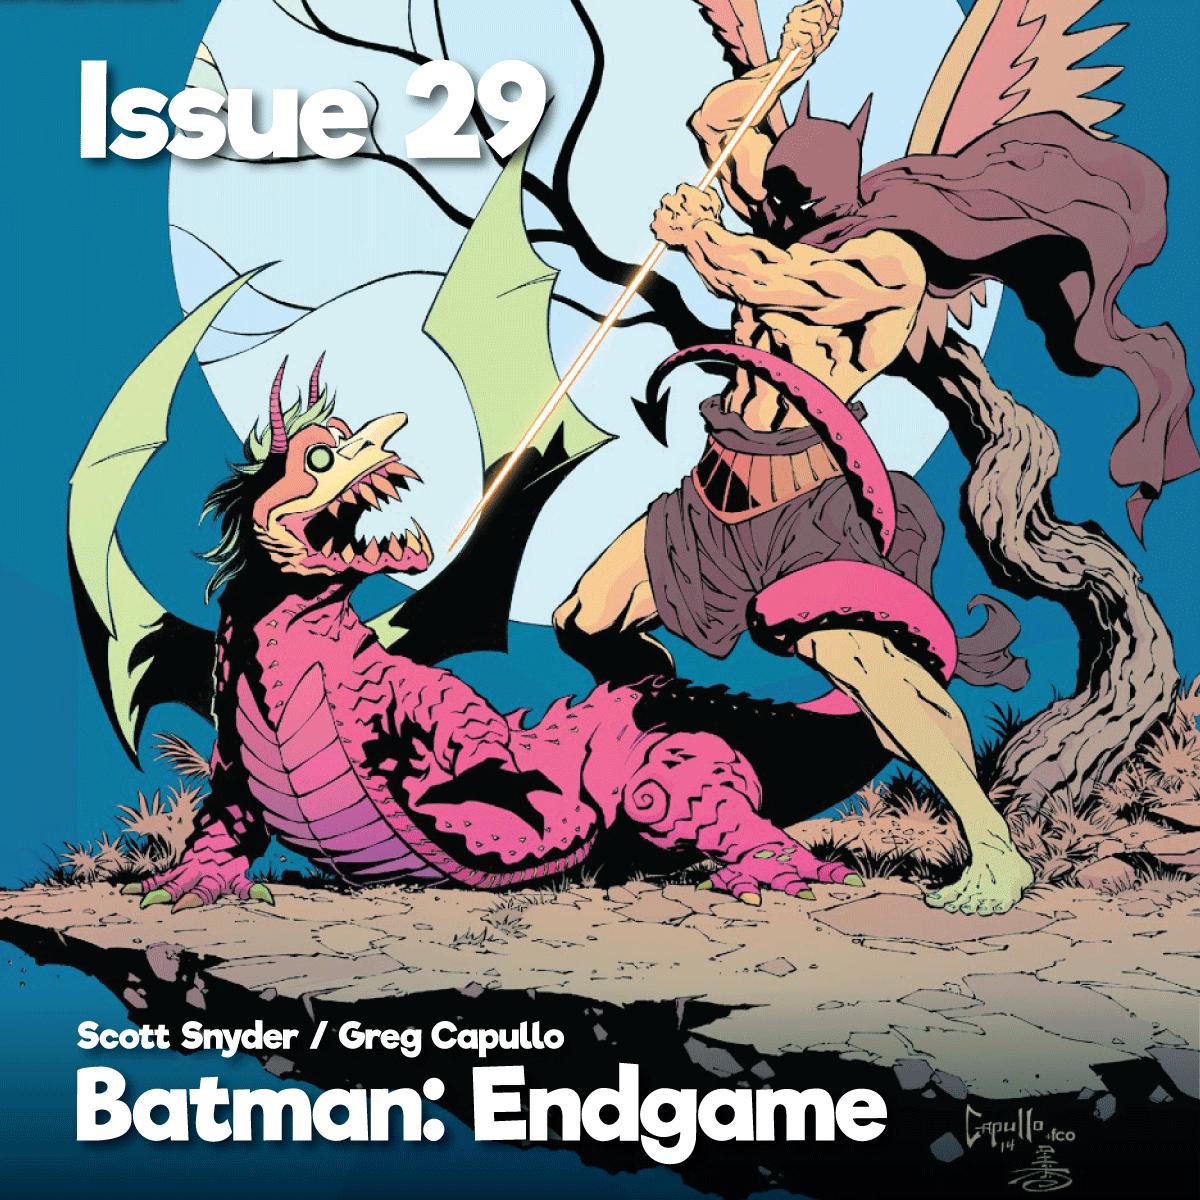 Issue29_BatmanEndgame_1200x1200.png